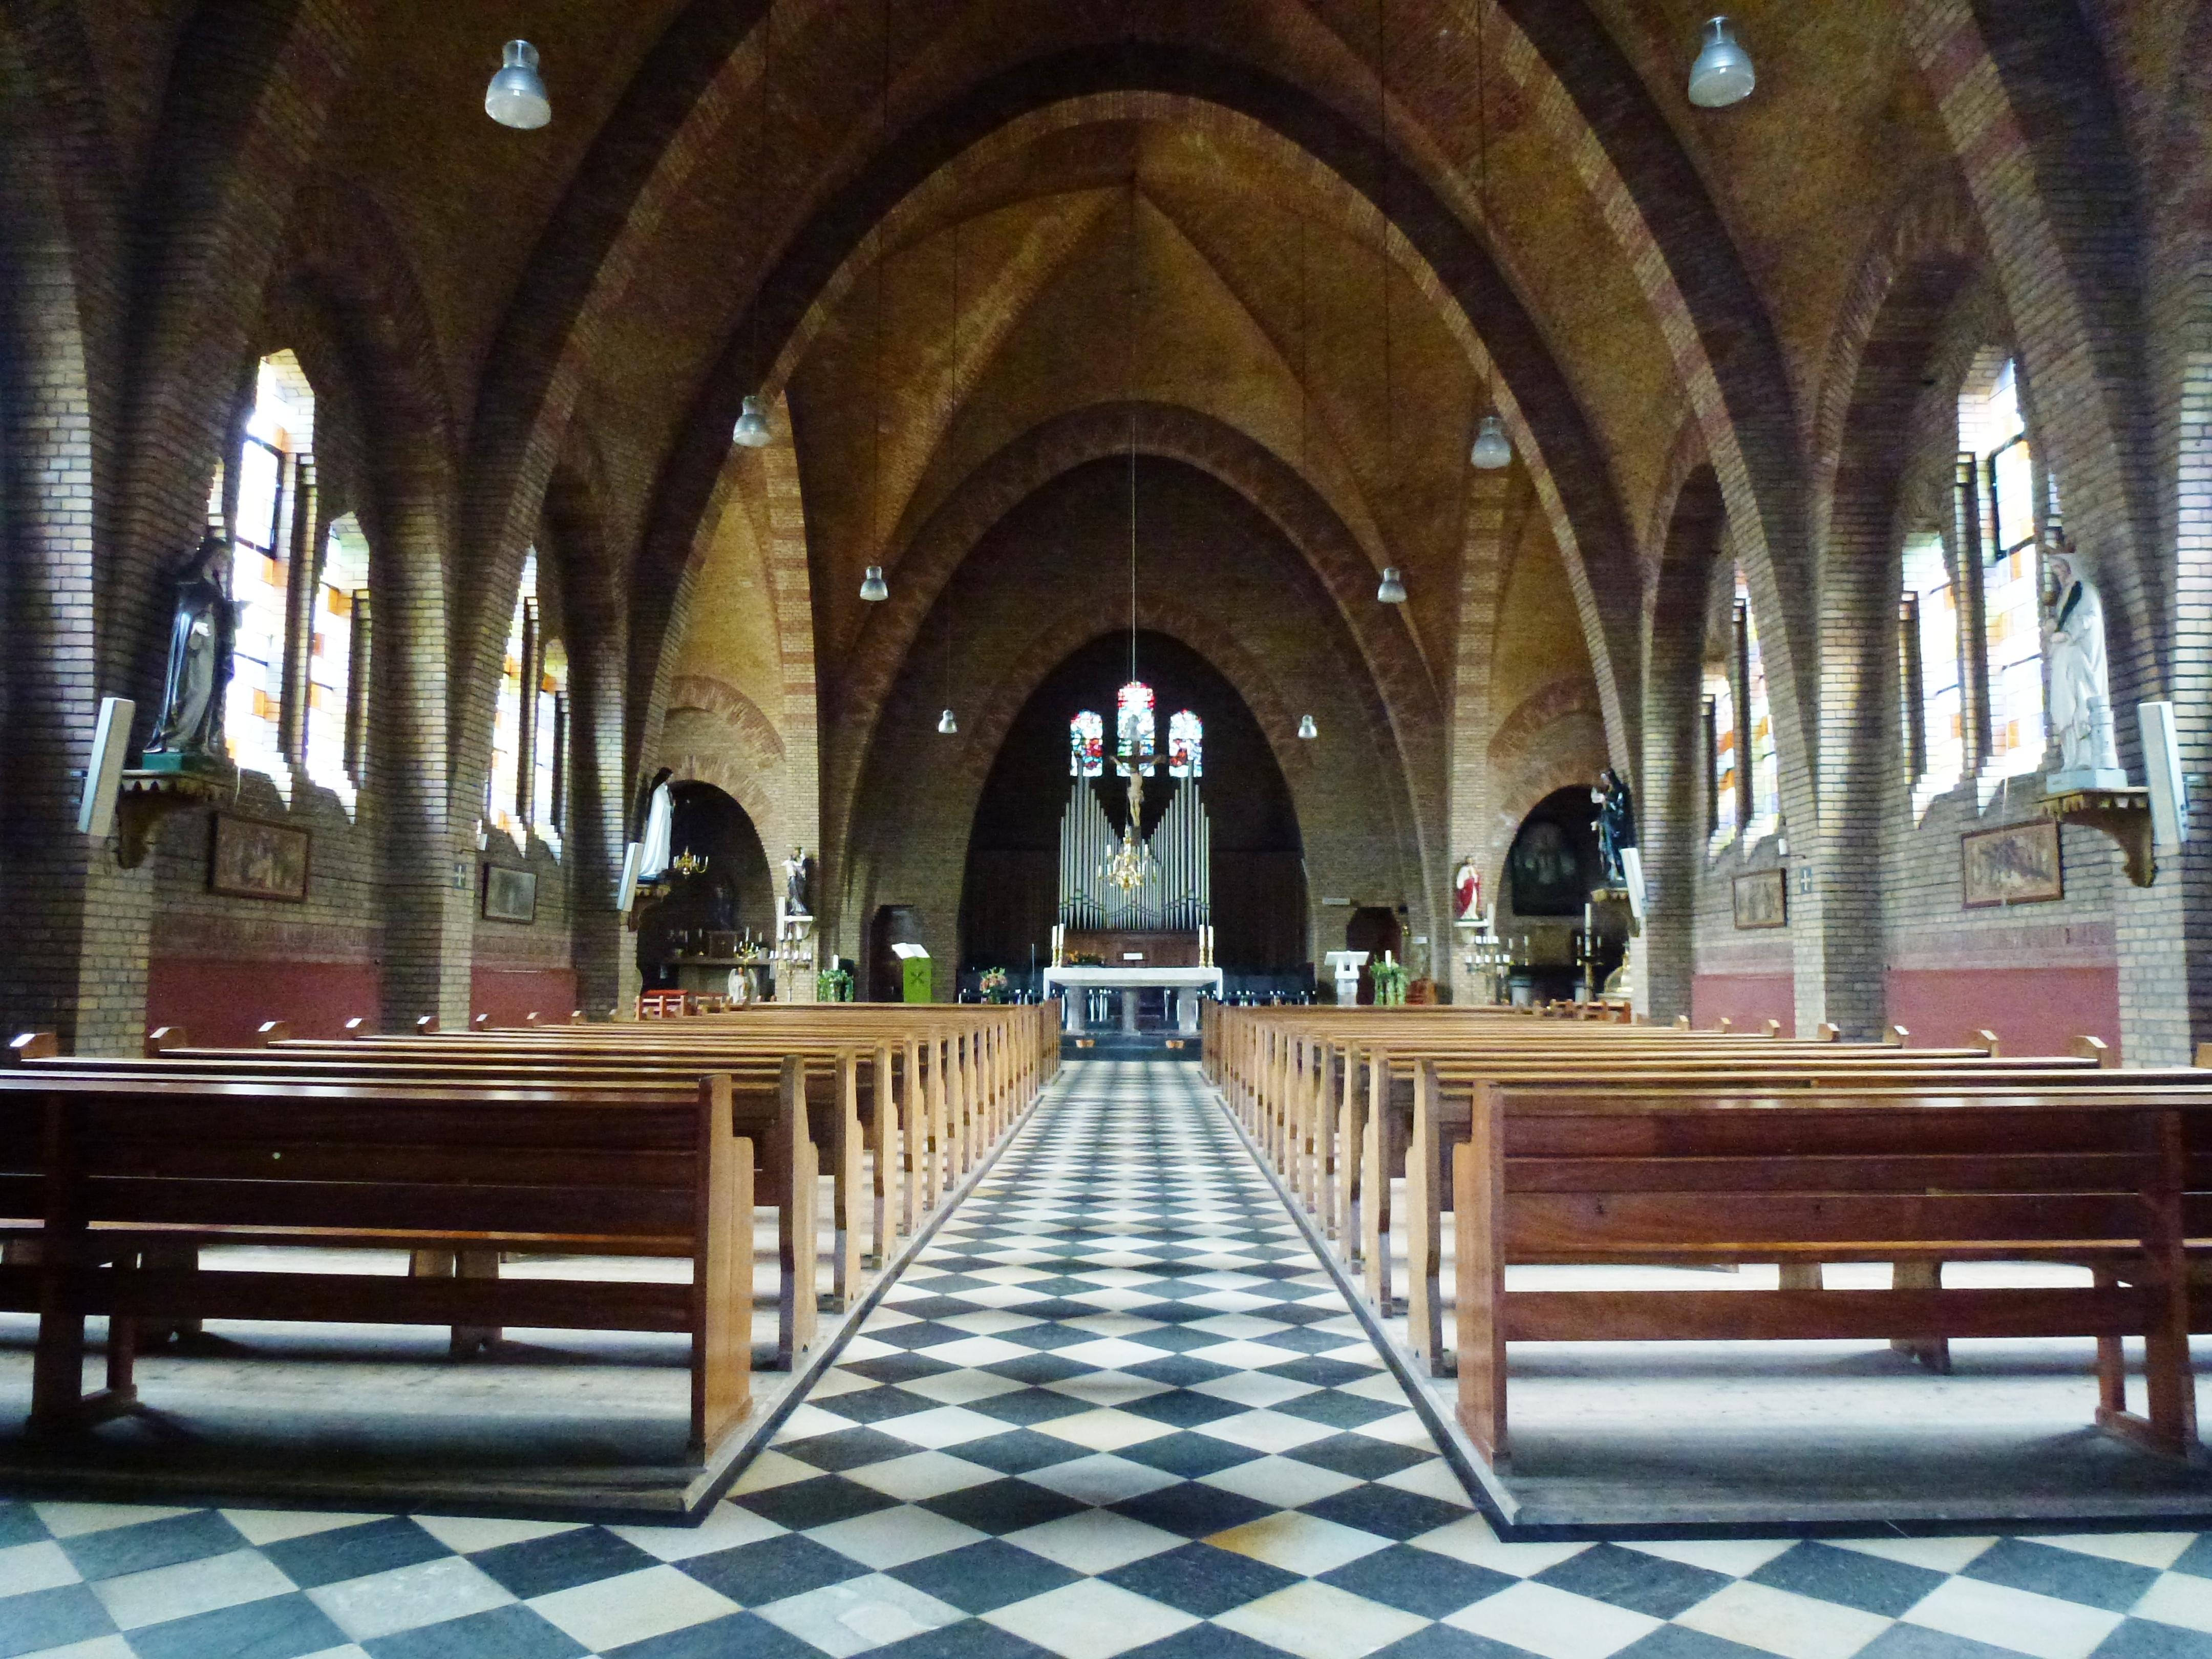 Bestand ubbergen leuth remigiuskerk interieur jpg wikipedia for Interieur wikipedia